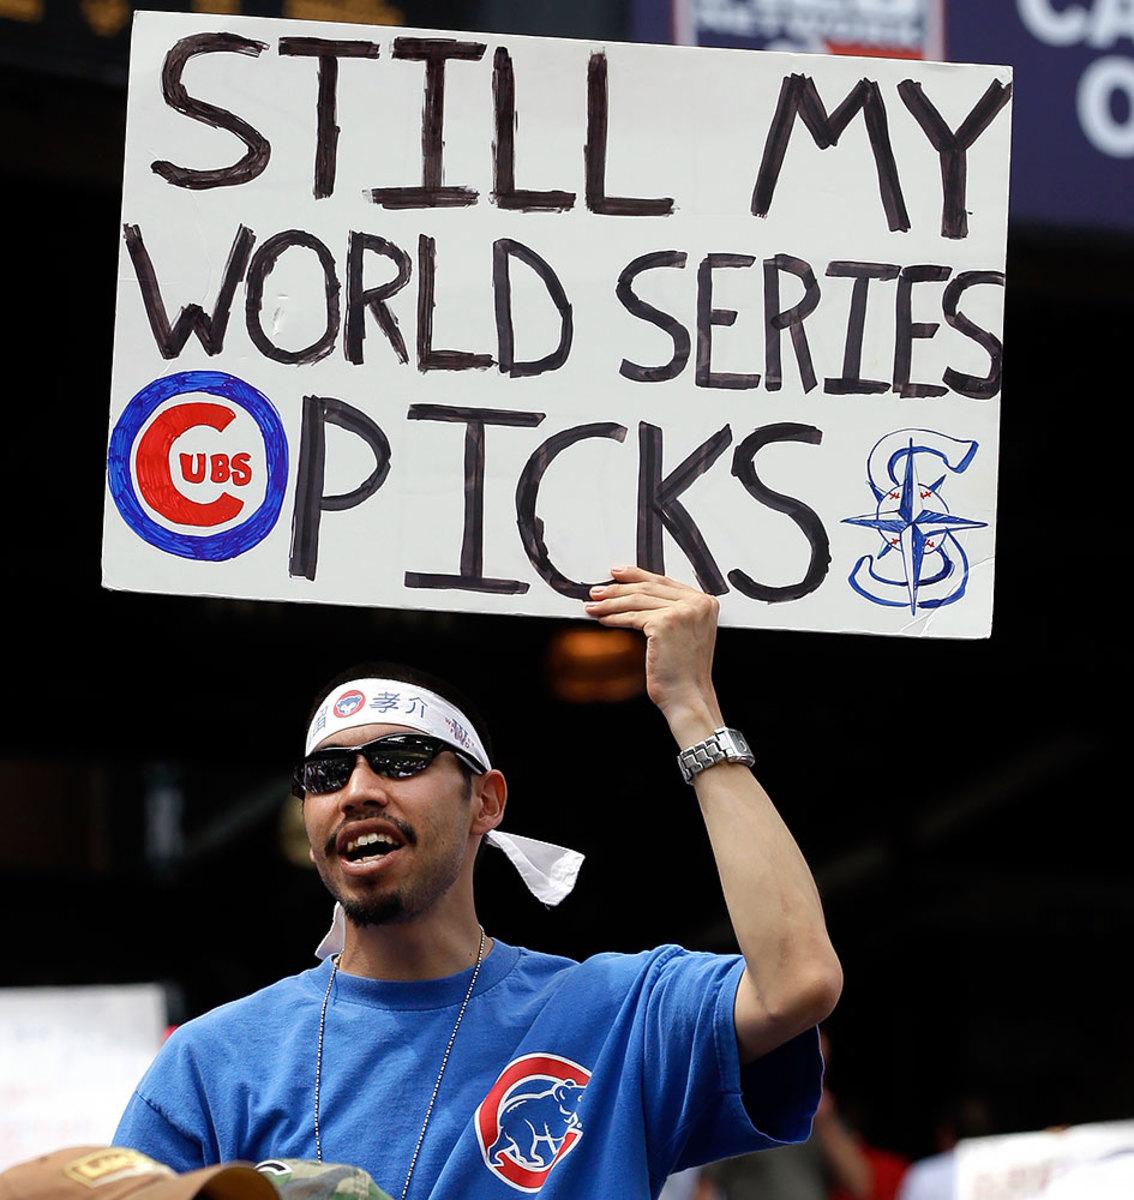 2010-Chicago-Cubs-fan-sign-AP_100624135719.jpg